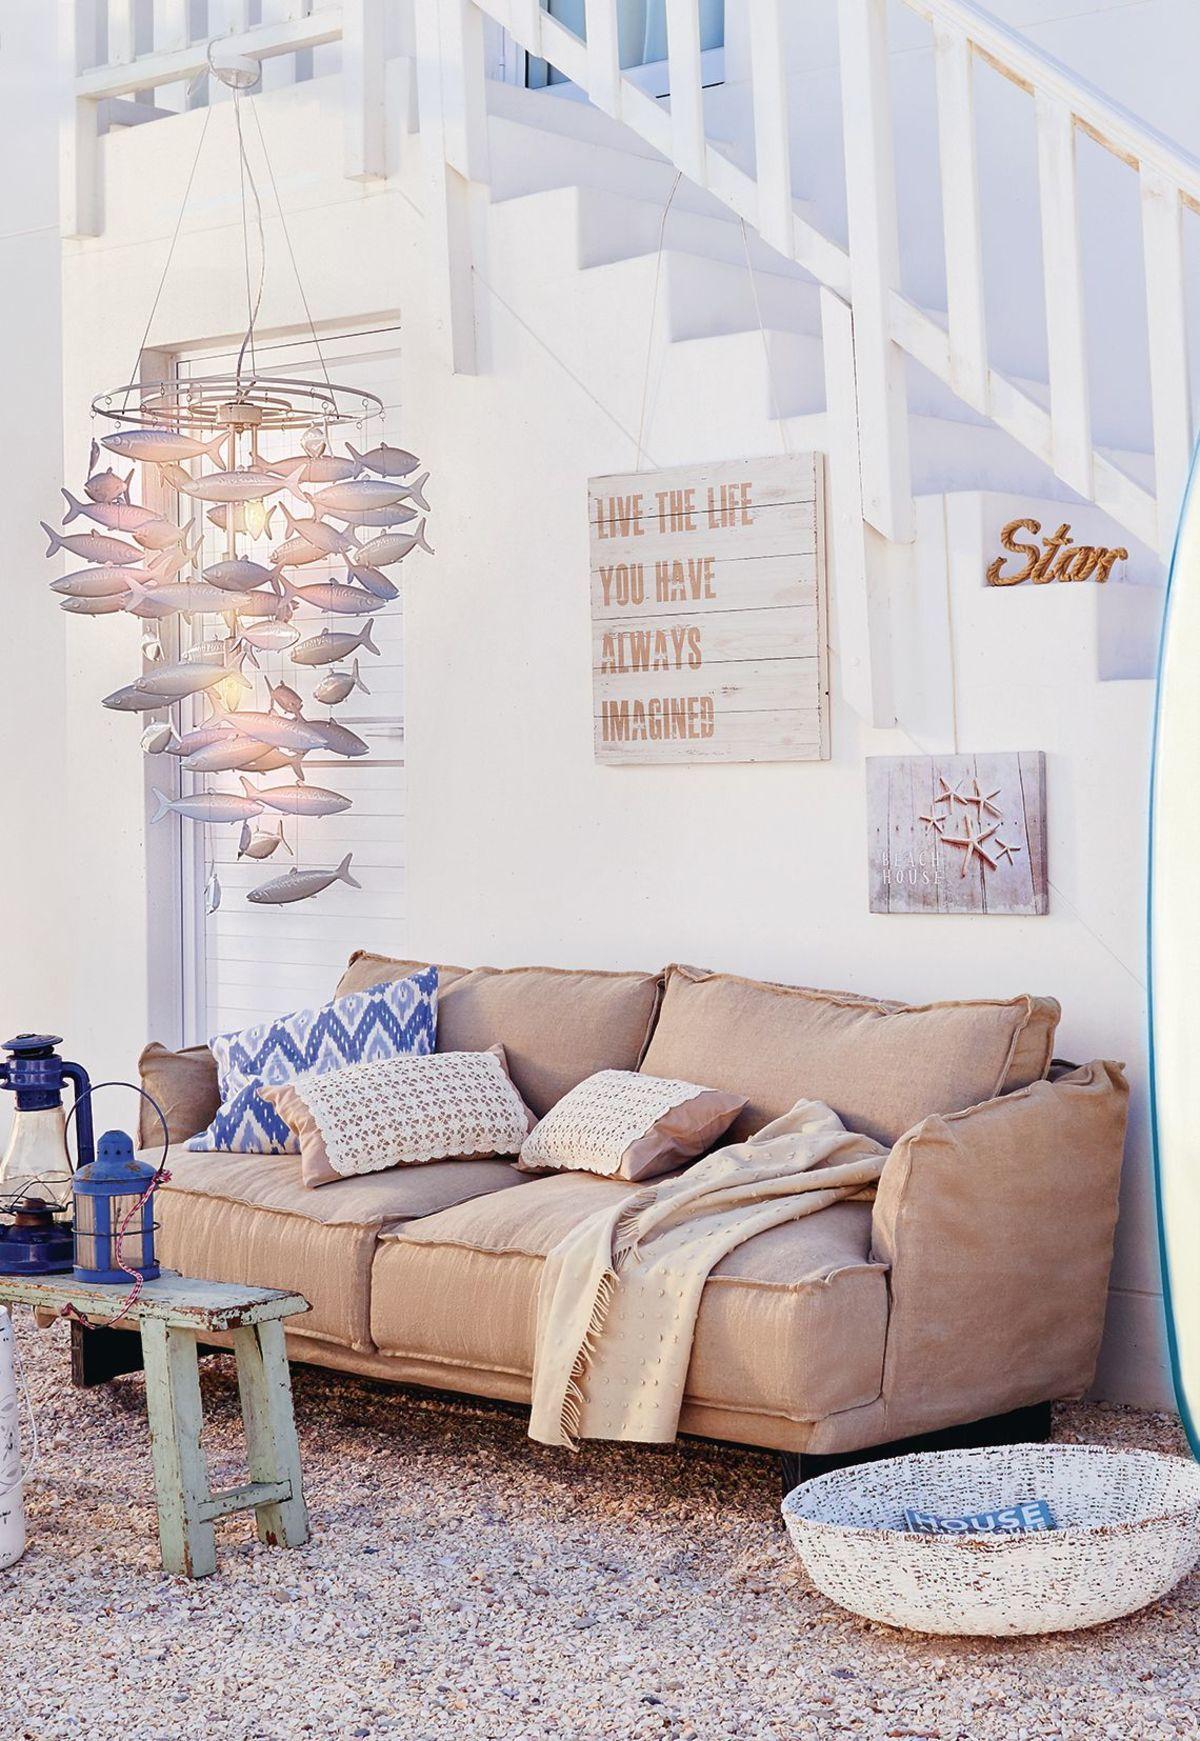 Sofa 2 5 sitzer abnehmbare husse shabby chic - Wanddekoration shabby chic ...